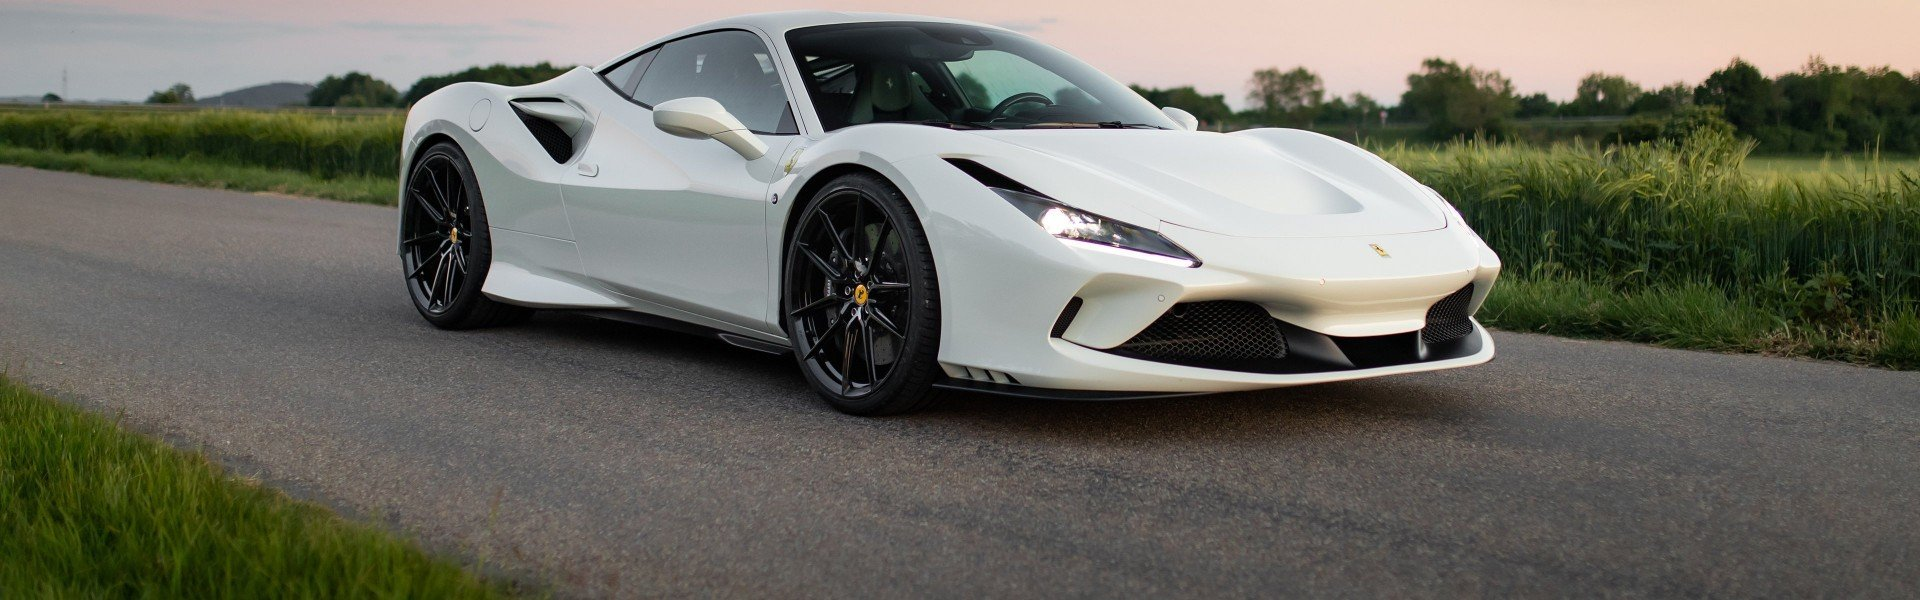 New Release Novitec Ferrari F8 Tributo Novitec Performance En Vogue